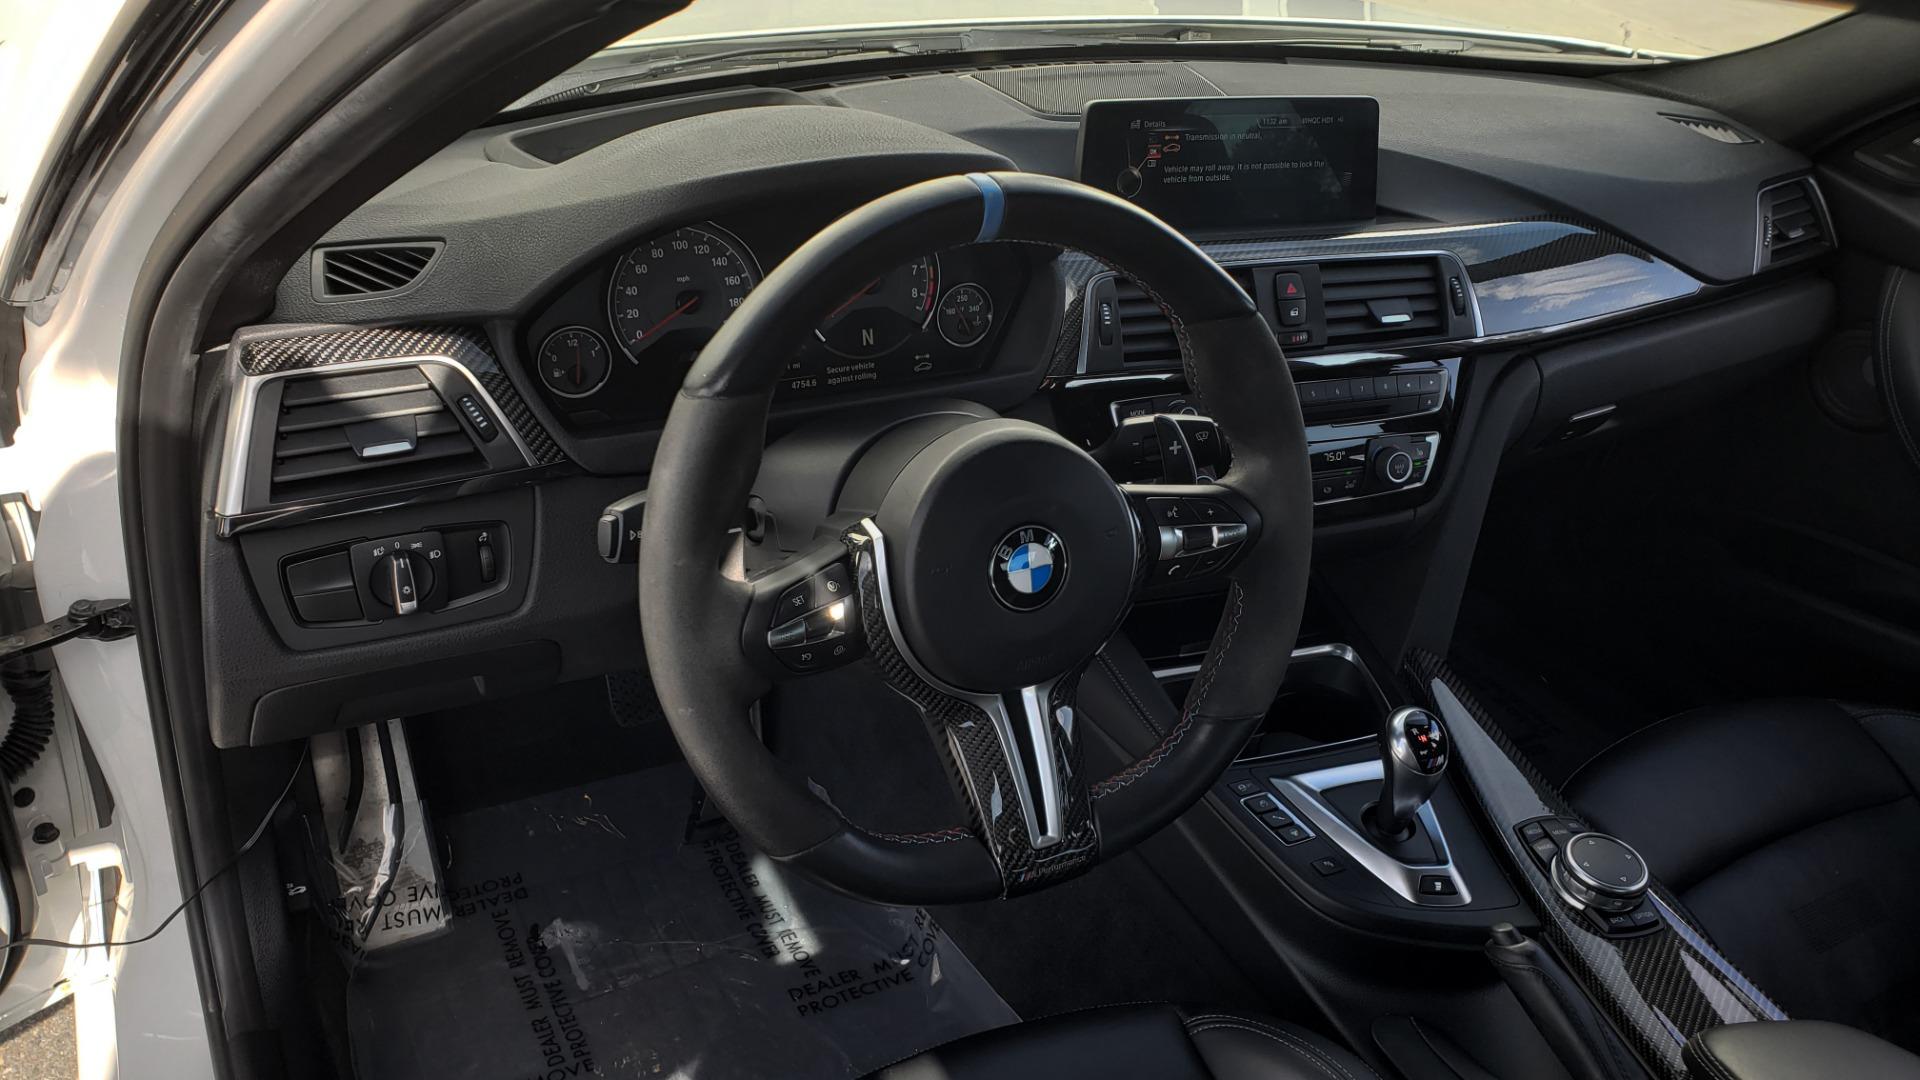 Used 2016 BMW M3 SEDAN / EXECUTIVE PKG / M-SUSPENSION / HARMAN/KARDON SOUND for sale Sold at Formula Imports in Charlotte NC 28227 42